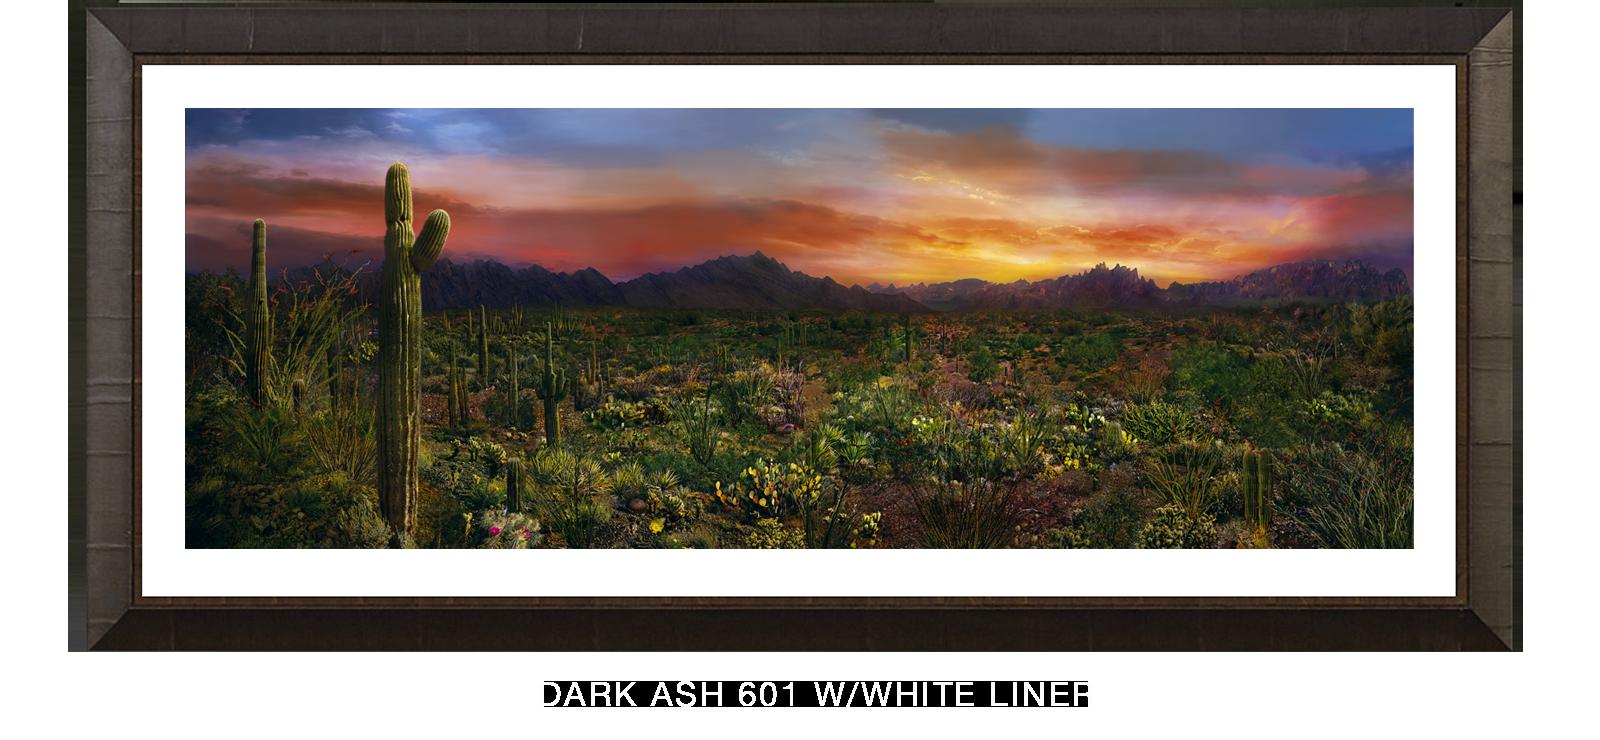 27EDEN VERNALIS Dark Ash 601 w_Wht Liner T